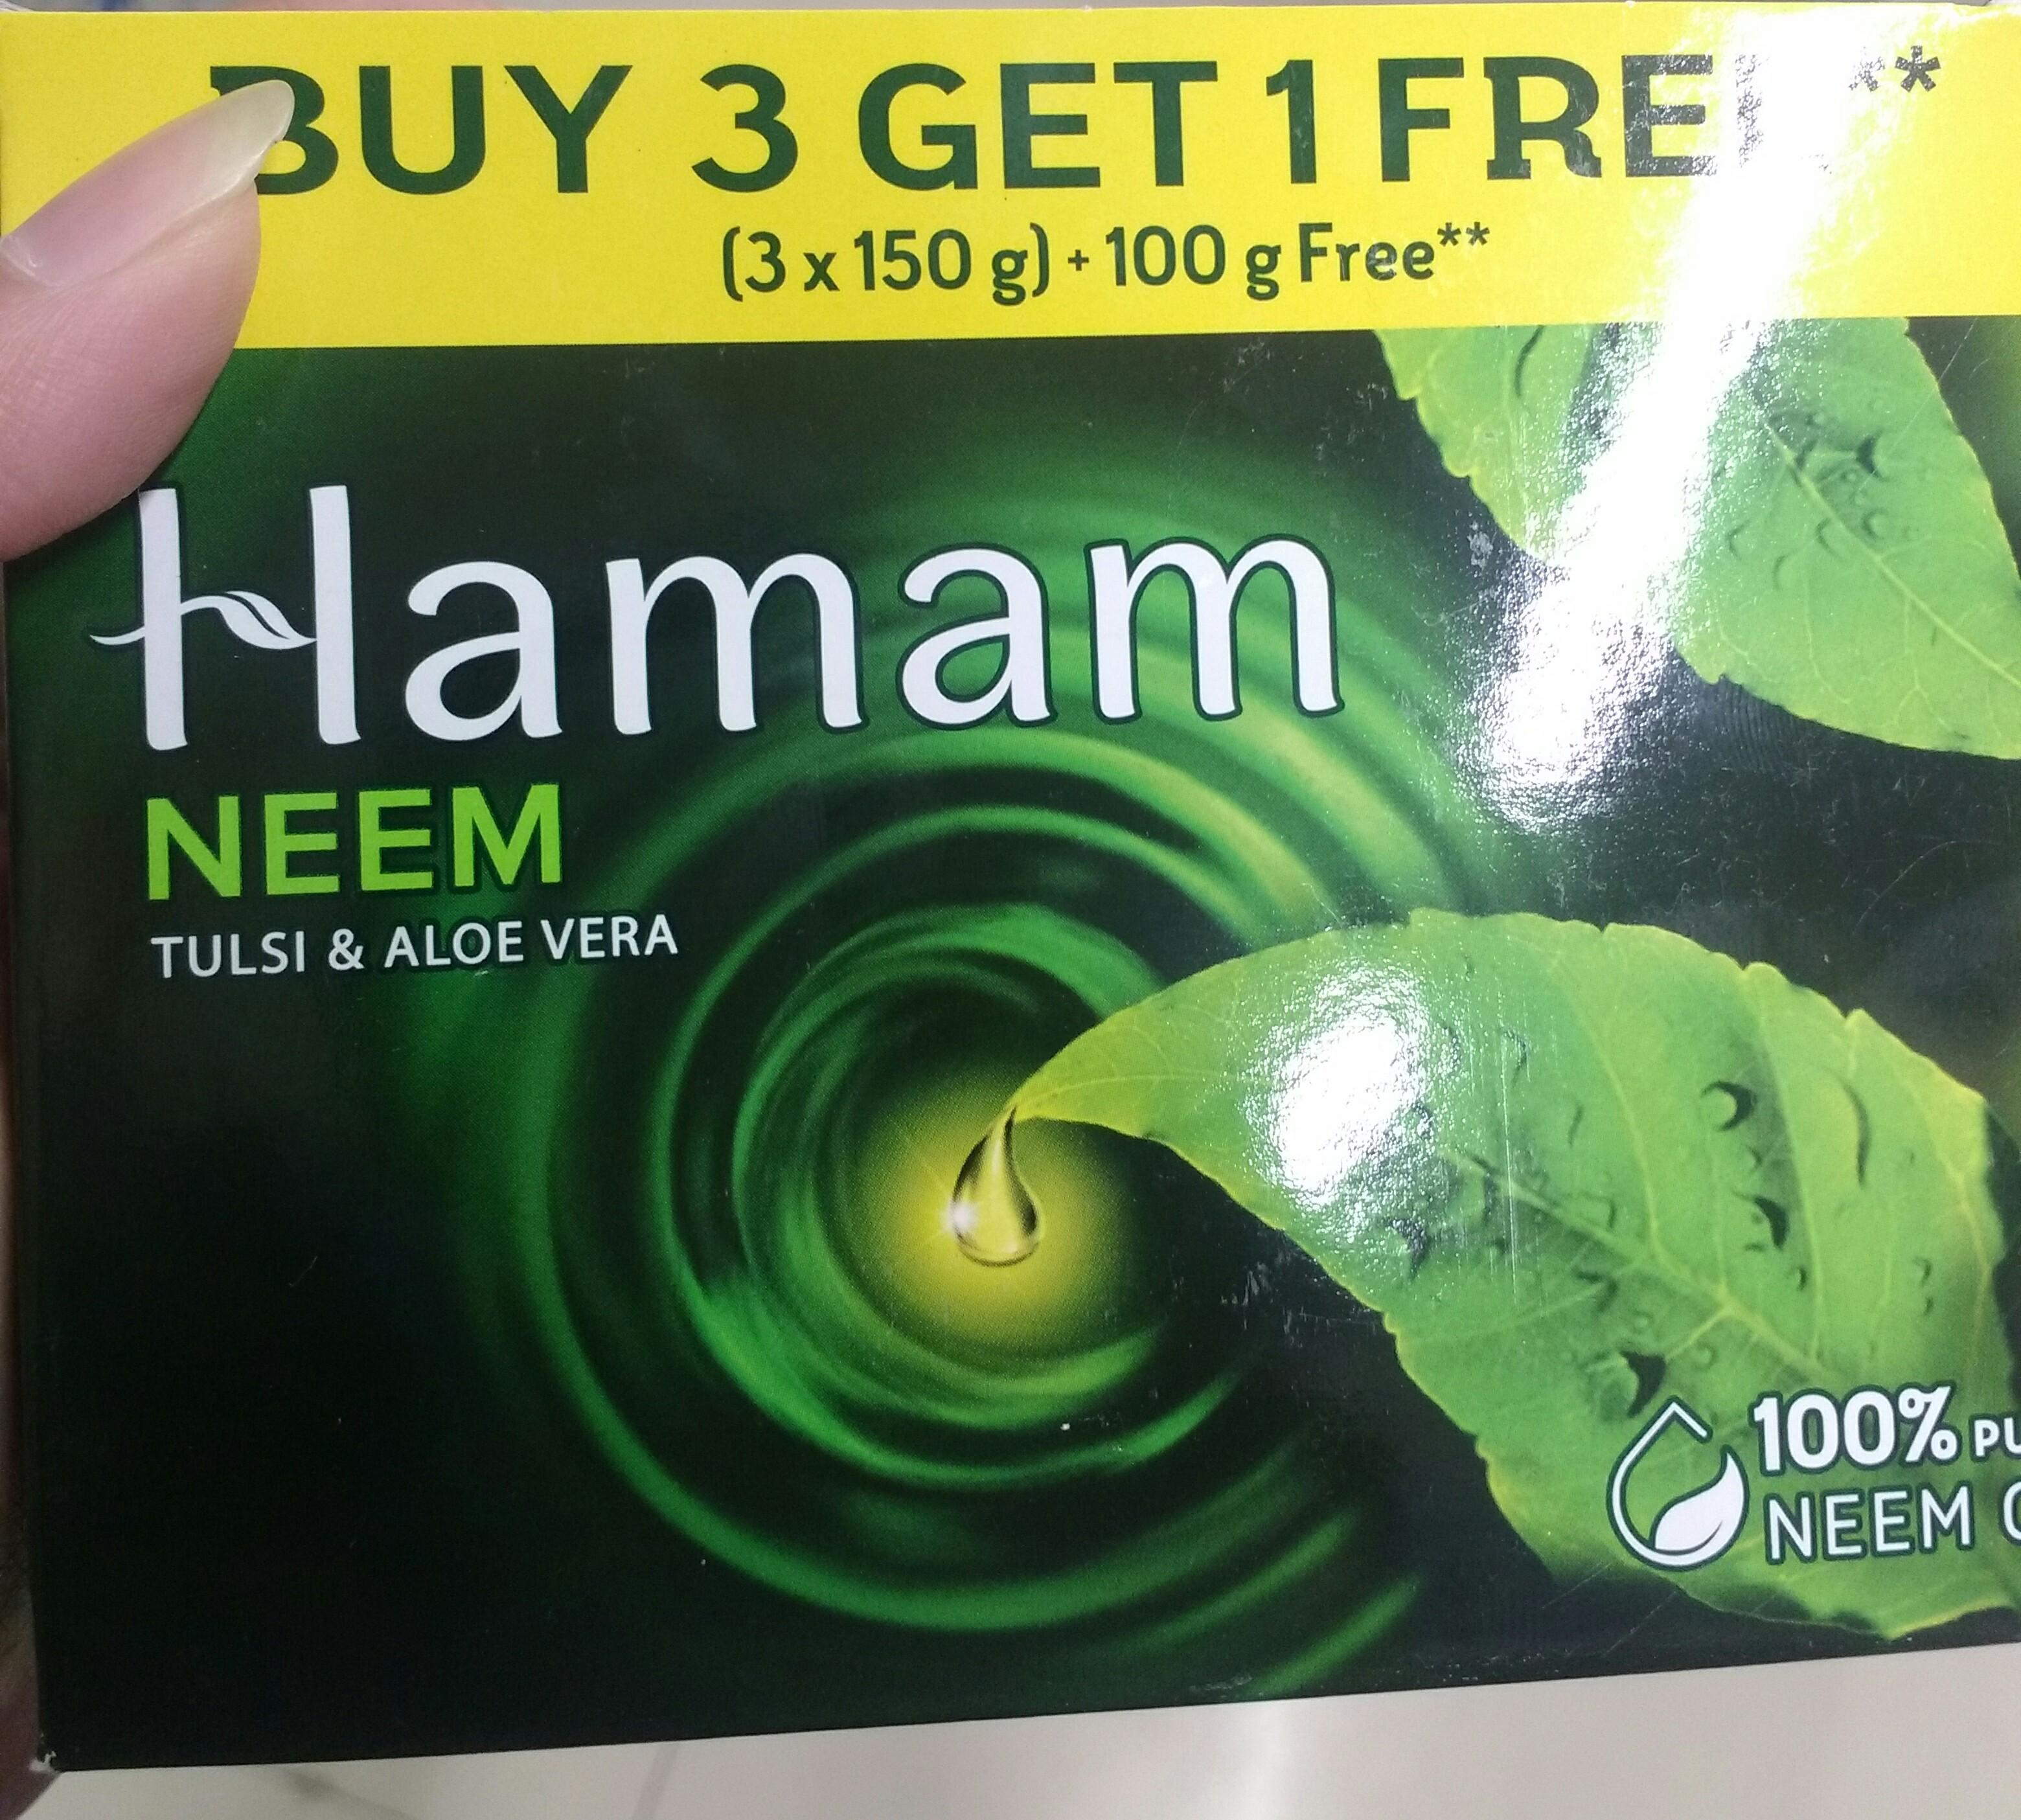 Hamam Neem Tulsi And Aloe Vera Soap Bar-Herbal soap-By ashwini_bhagat